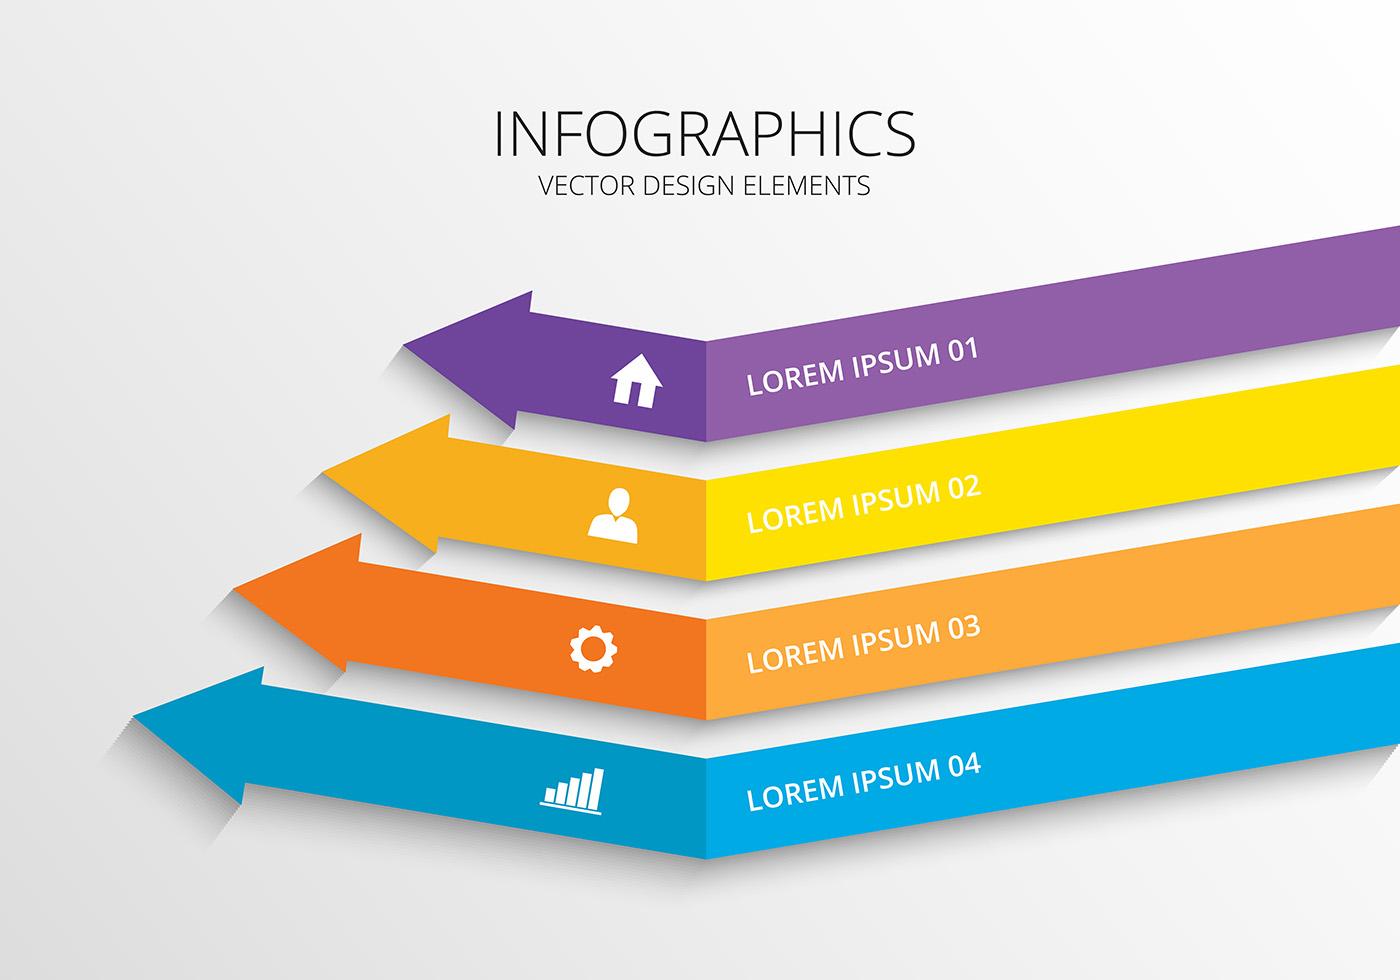 infographic 3d design vector